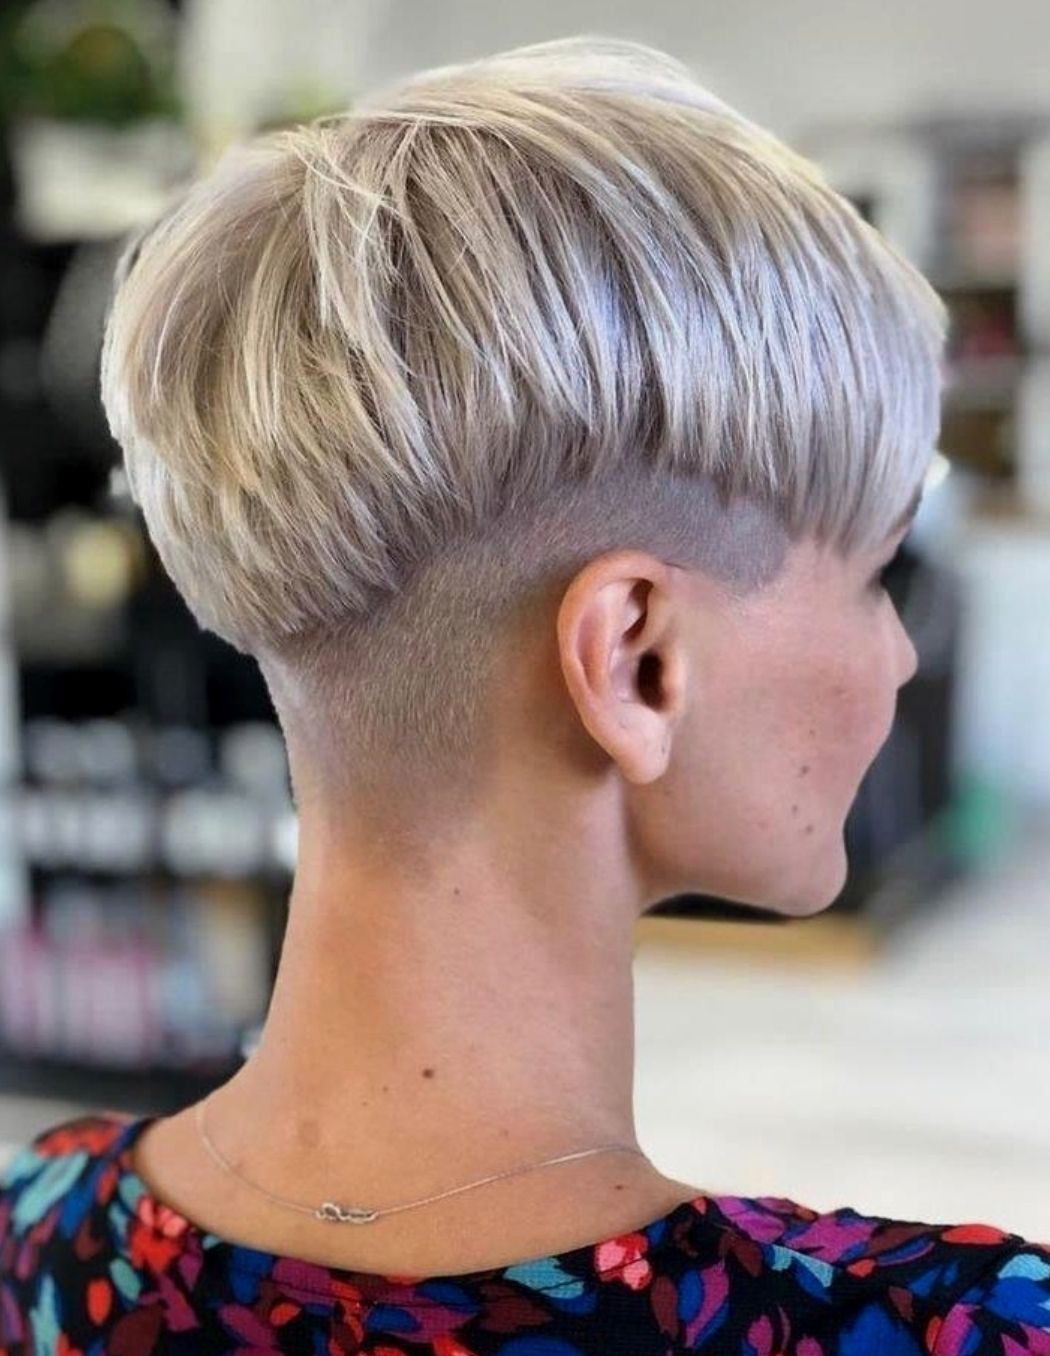 Frisuren  Frisuren kurze haare braun, Kurzhaarfrisuren